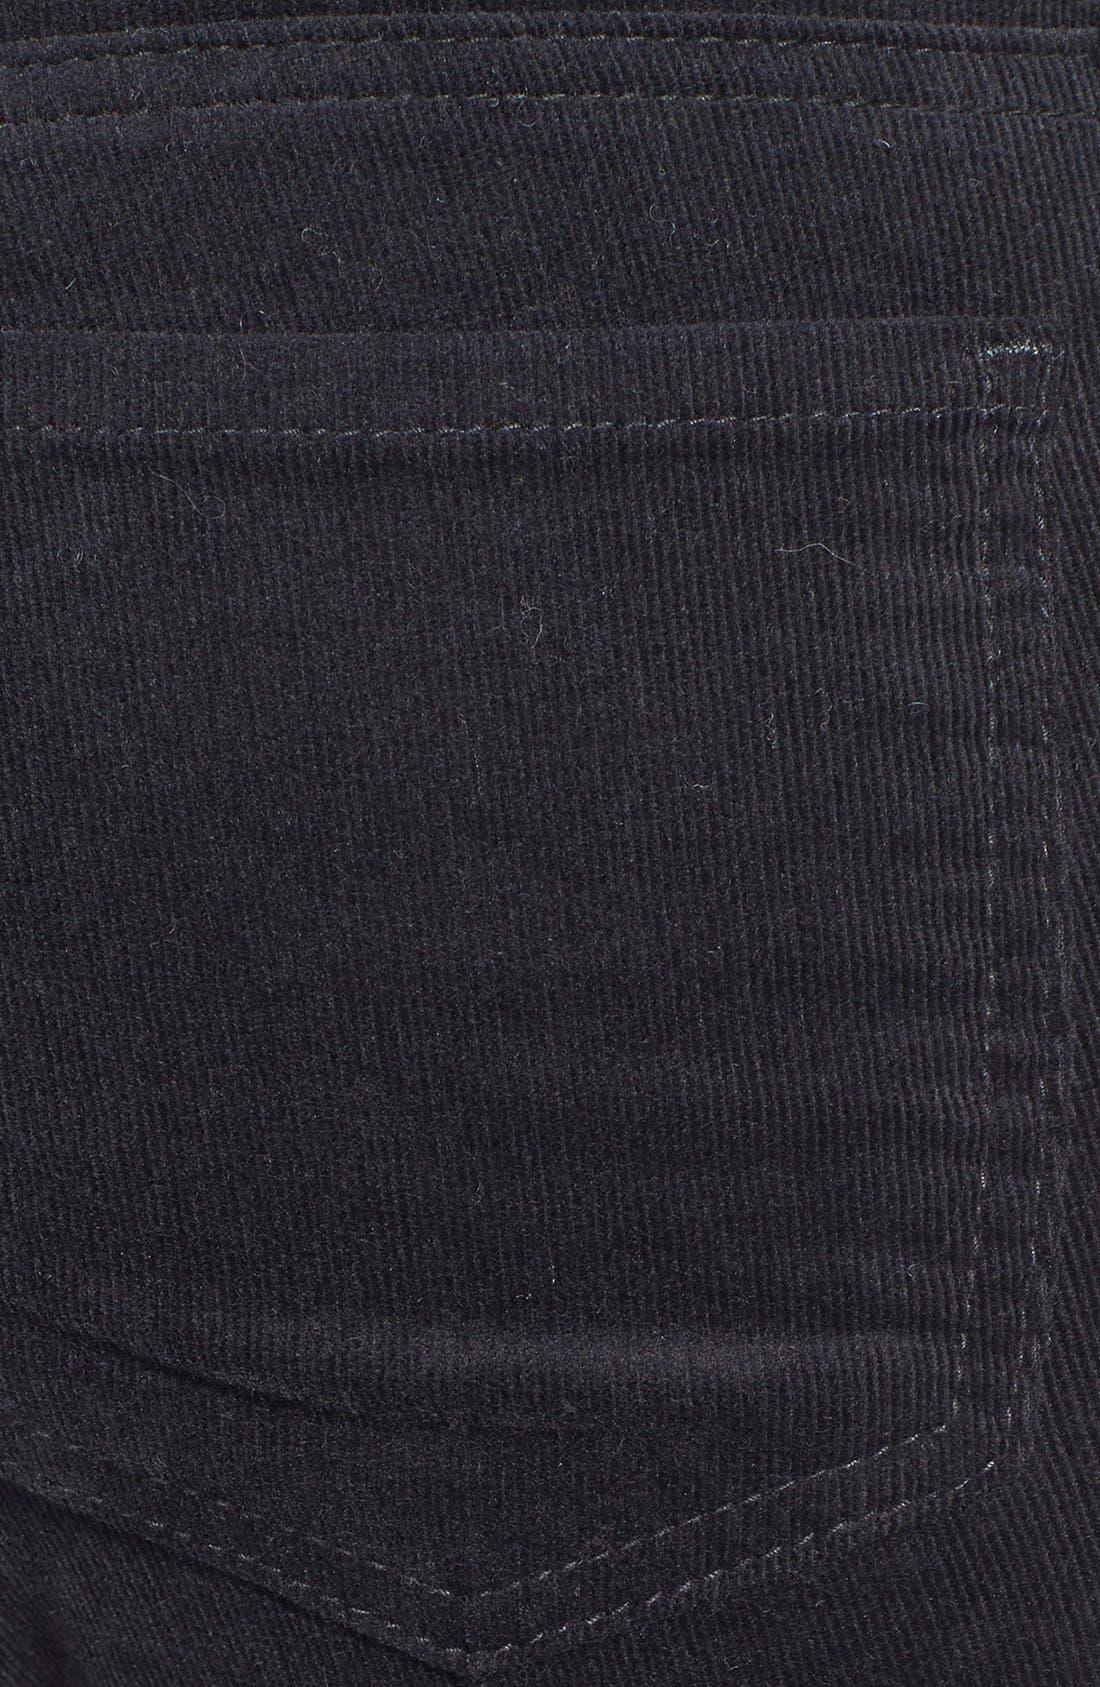 'Diana' Stretch Corduroy Skinny Pants,                             Alternate thumbnail 122, color,